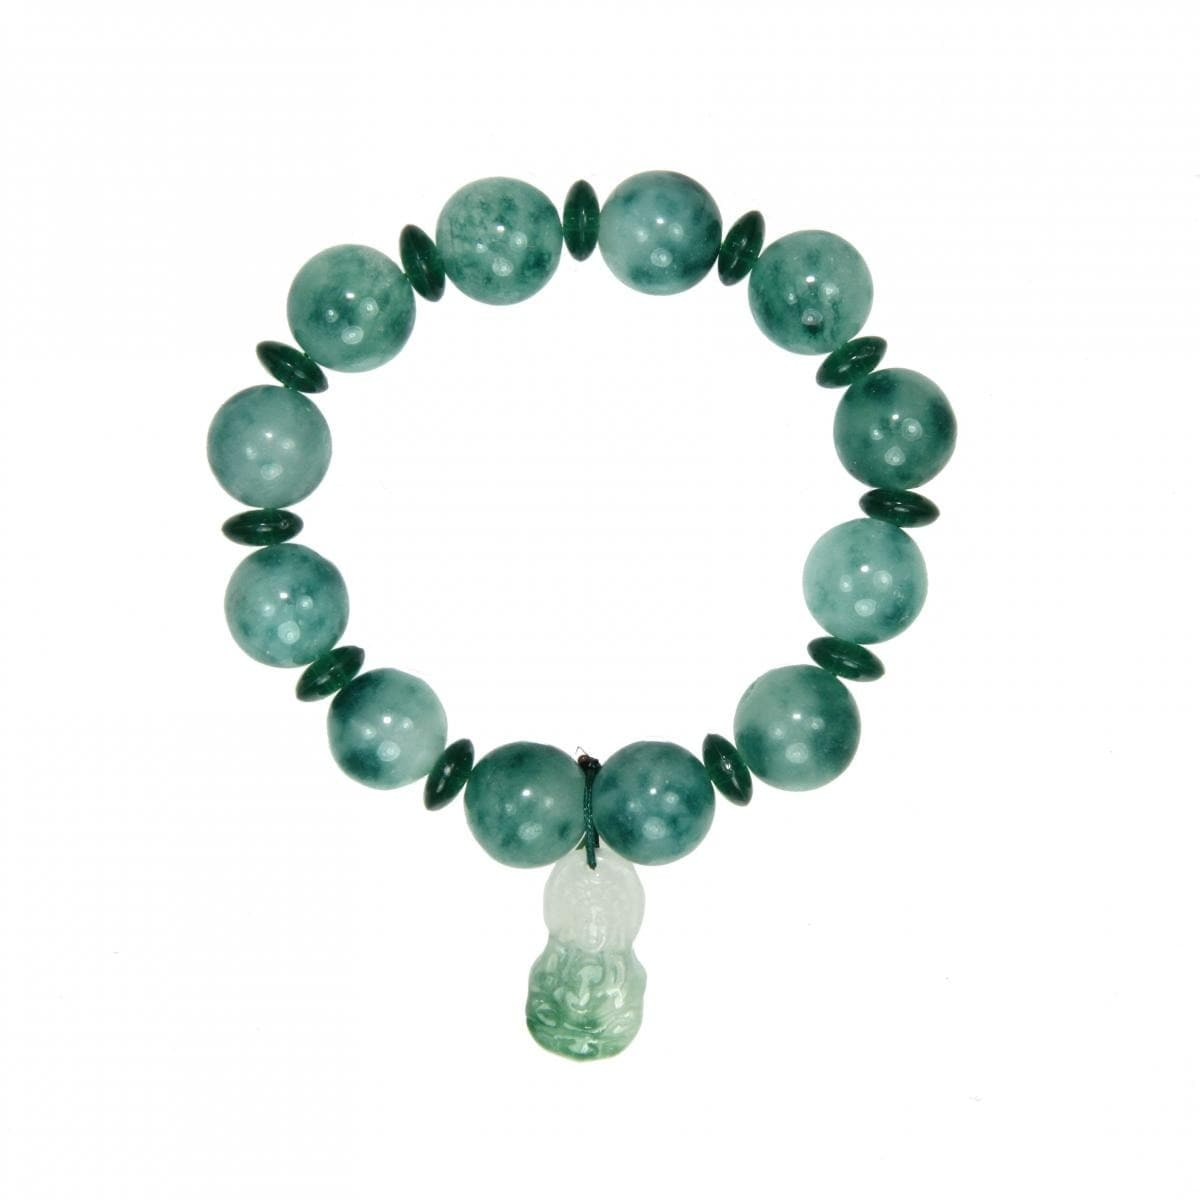 7969f4f33b4d8 Handmade Elastic Jade Bracelet with Buddha Charm (China)